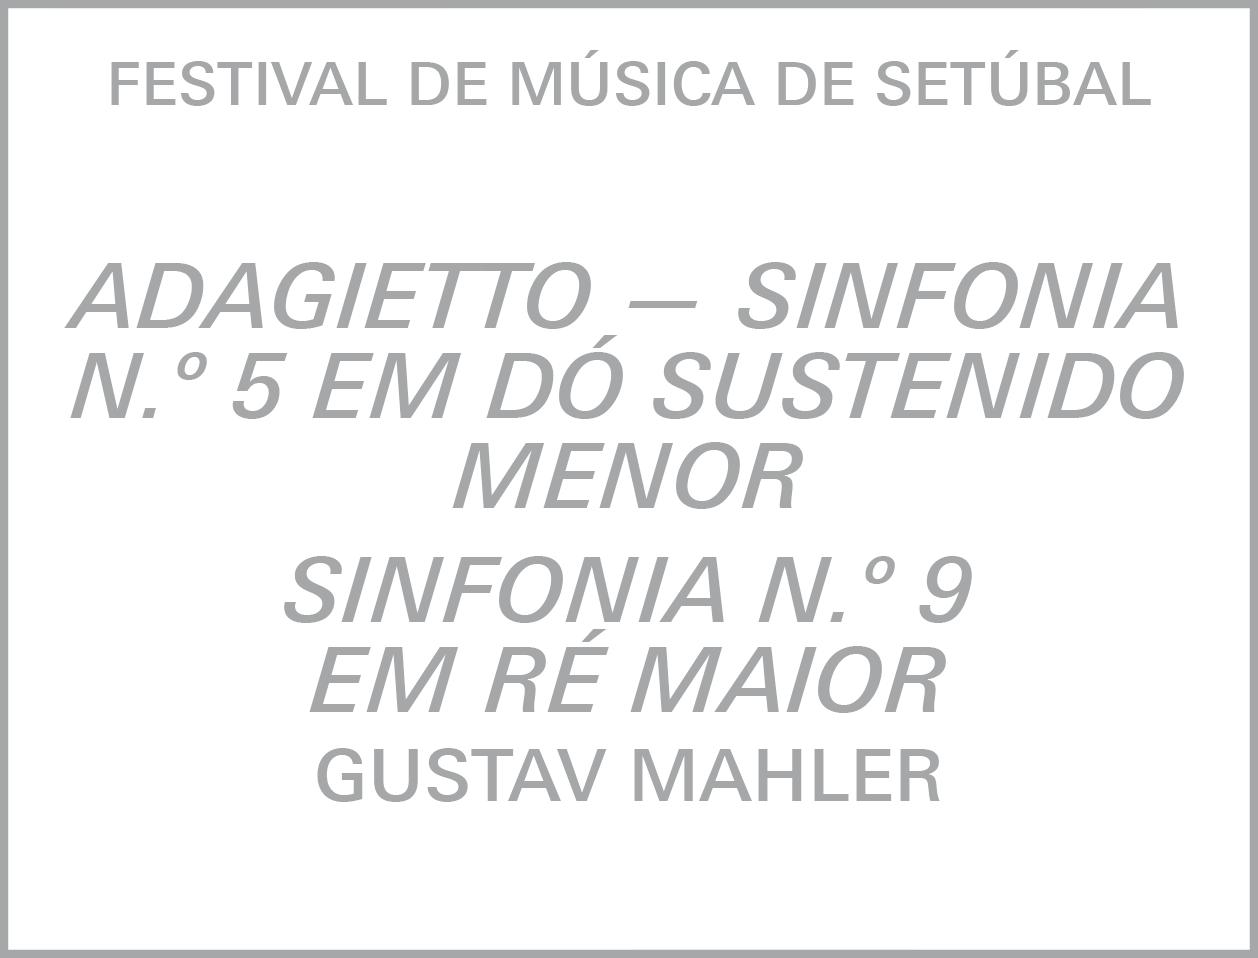 Festival de Música de Setúbal